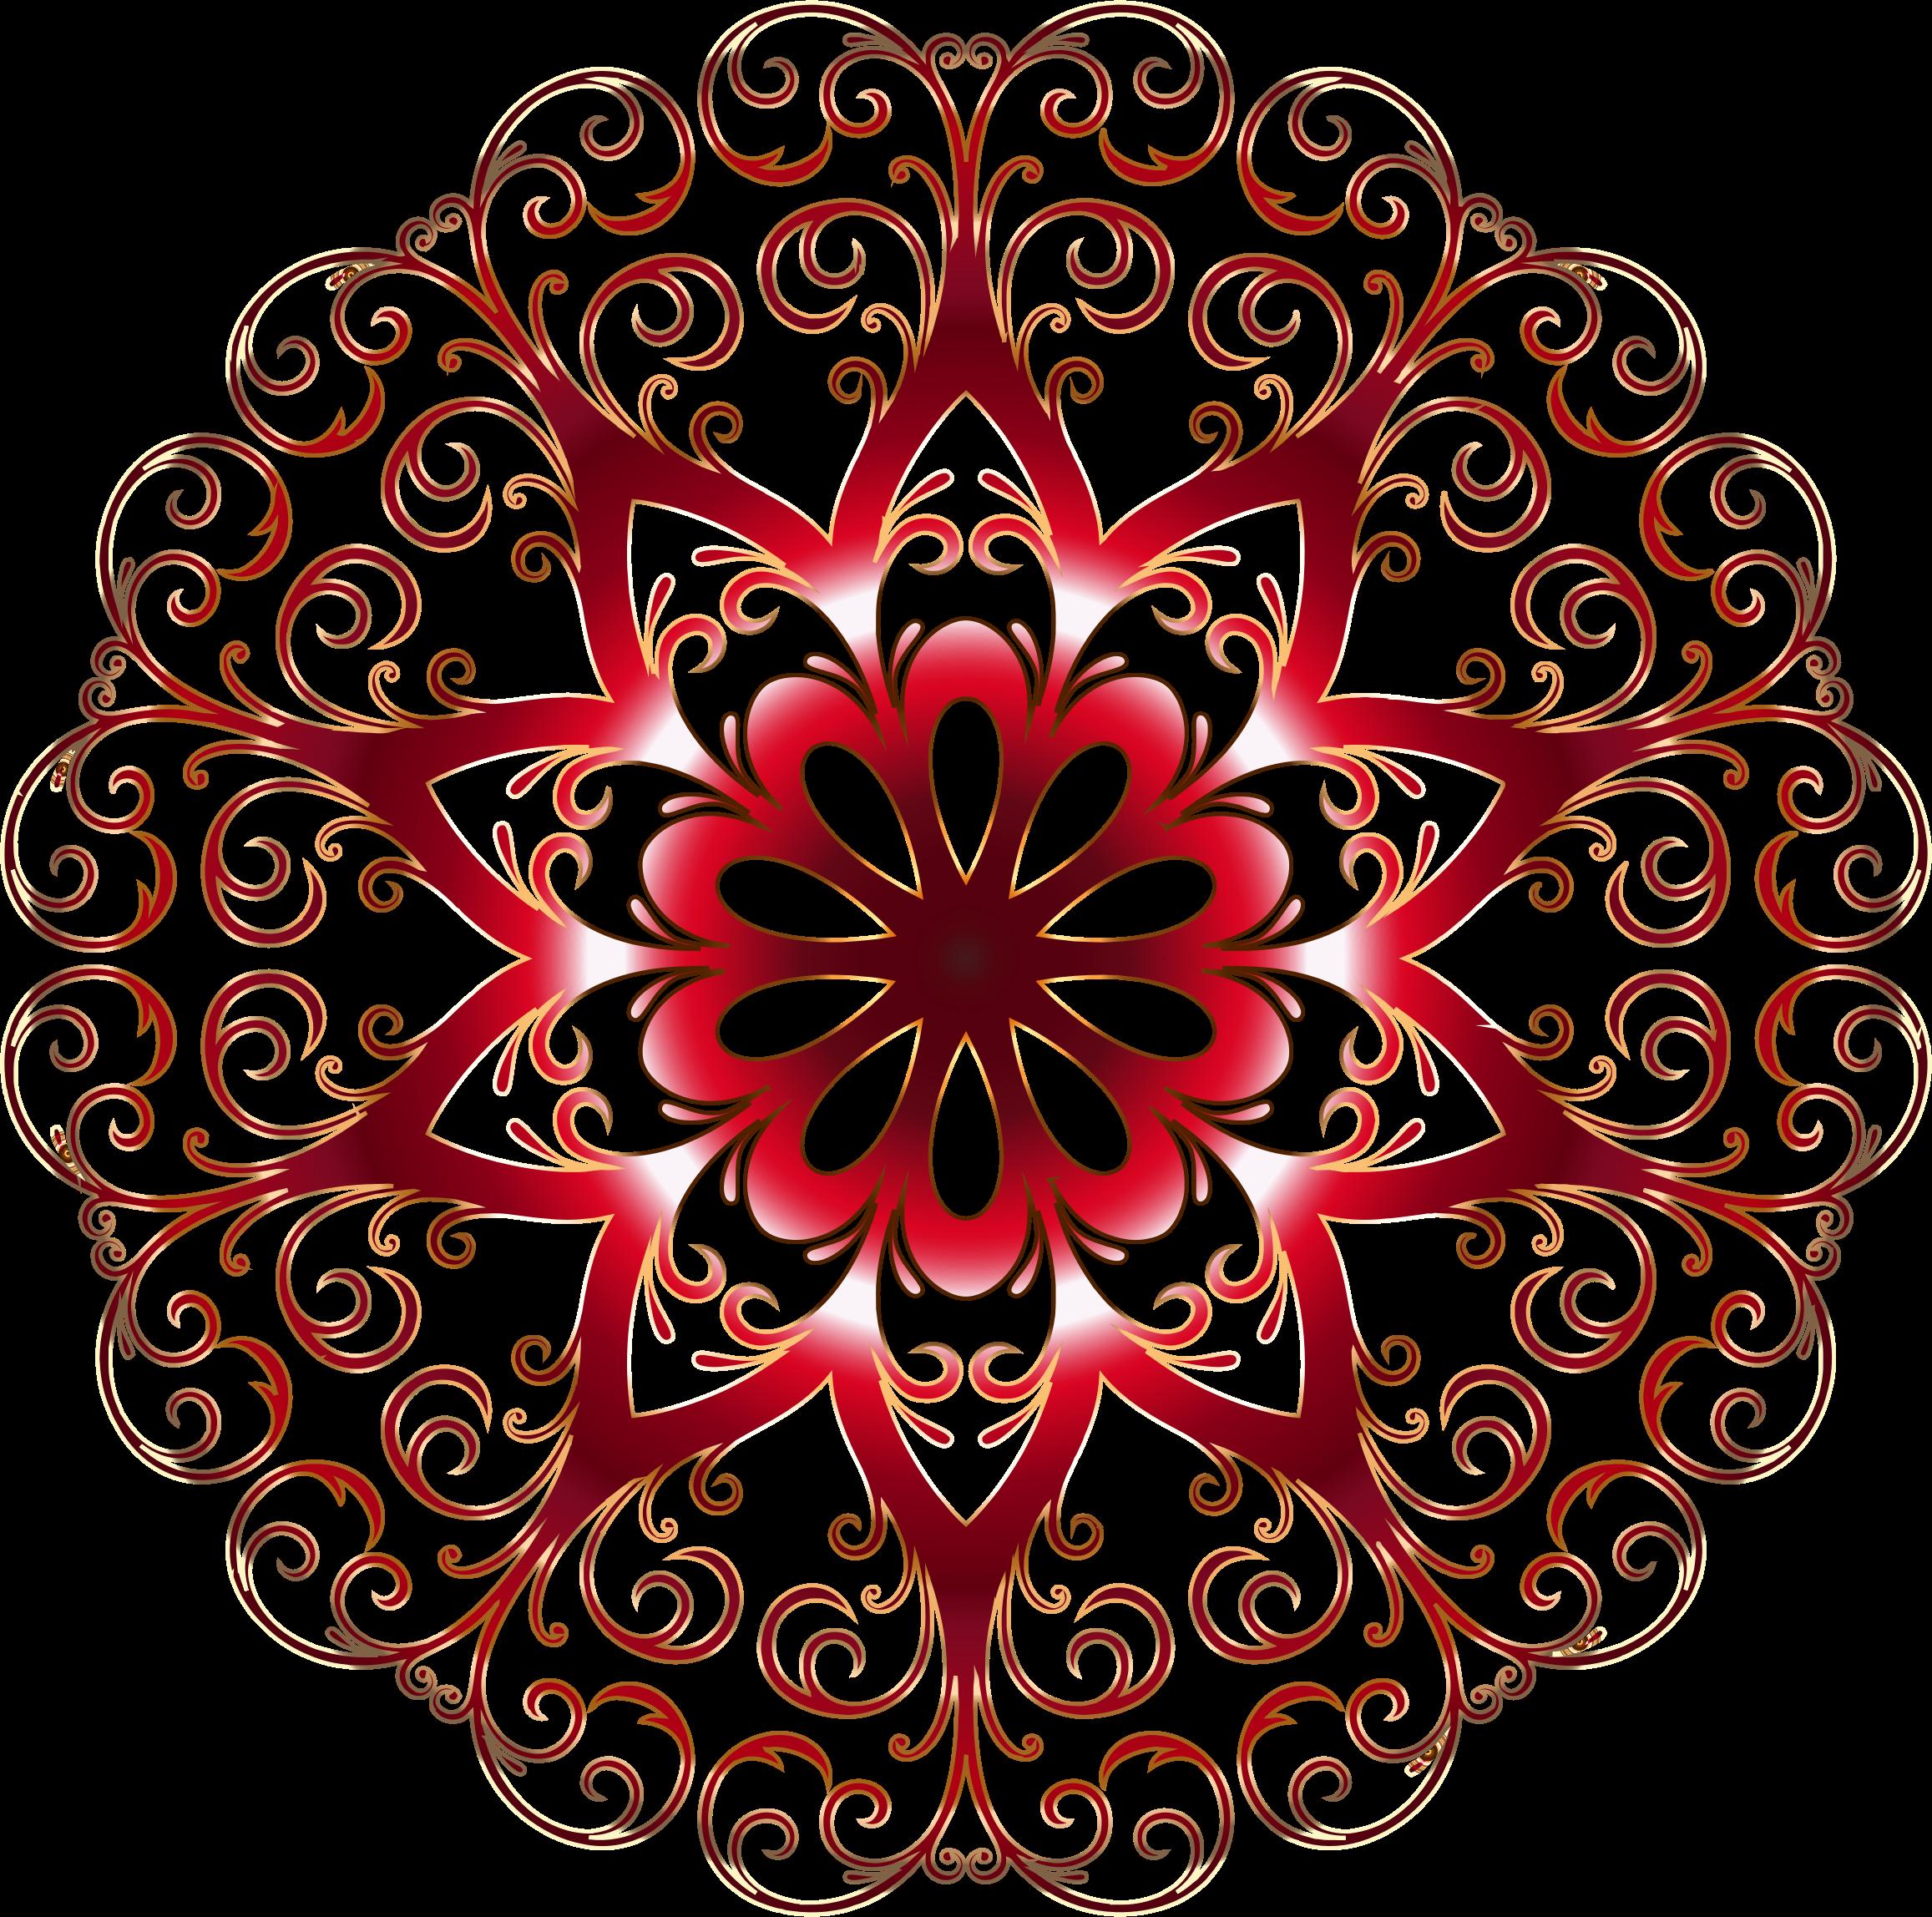 Rainbow snowflake clipart clip art freeuse stock Clipart - Prismatic Flourish Snowflake 3 No Background clip art freeuse stock